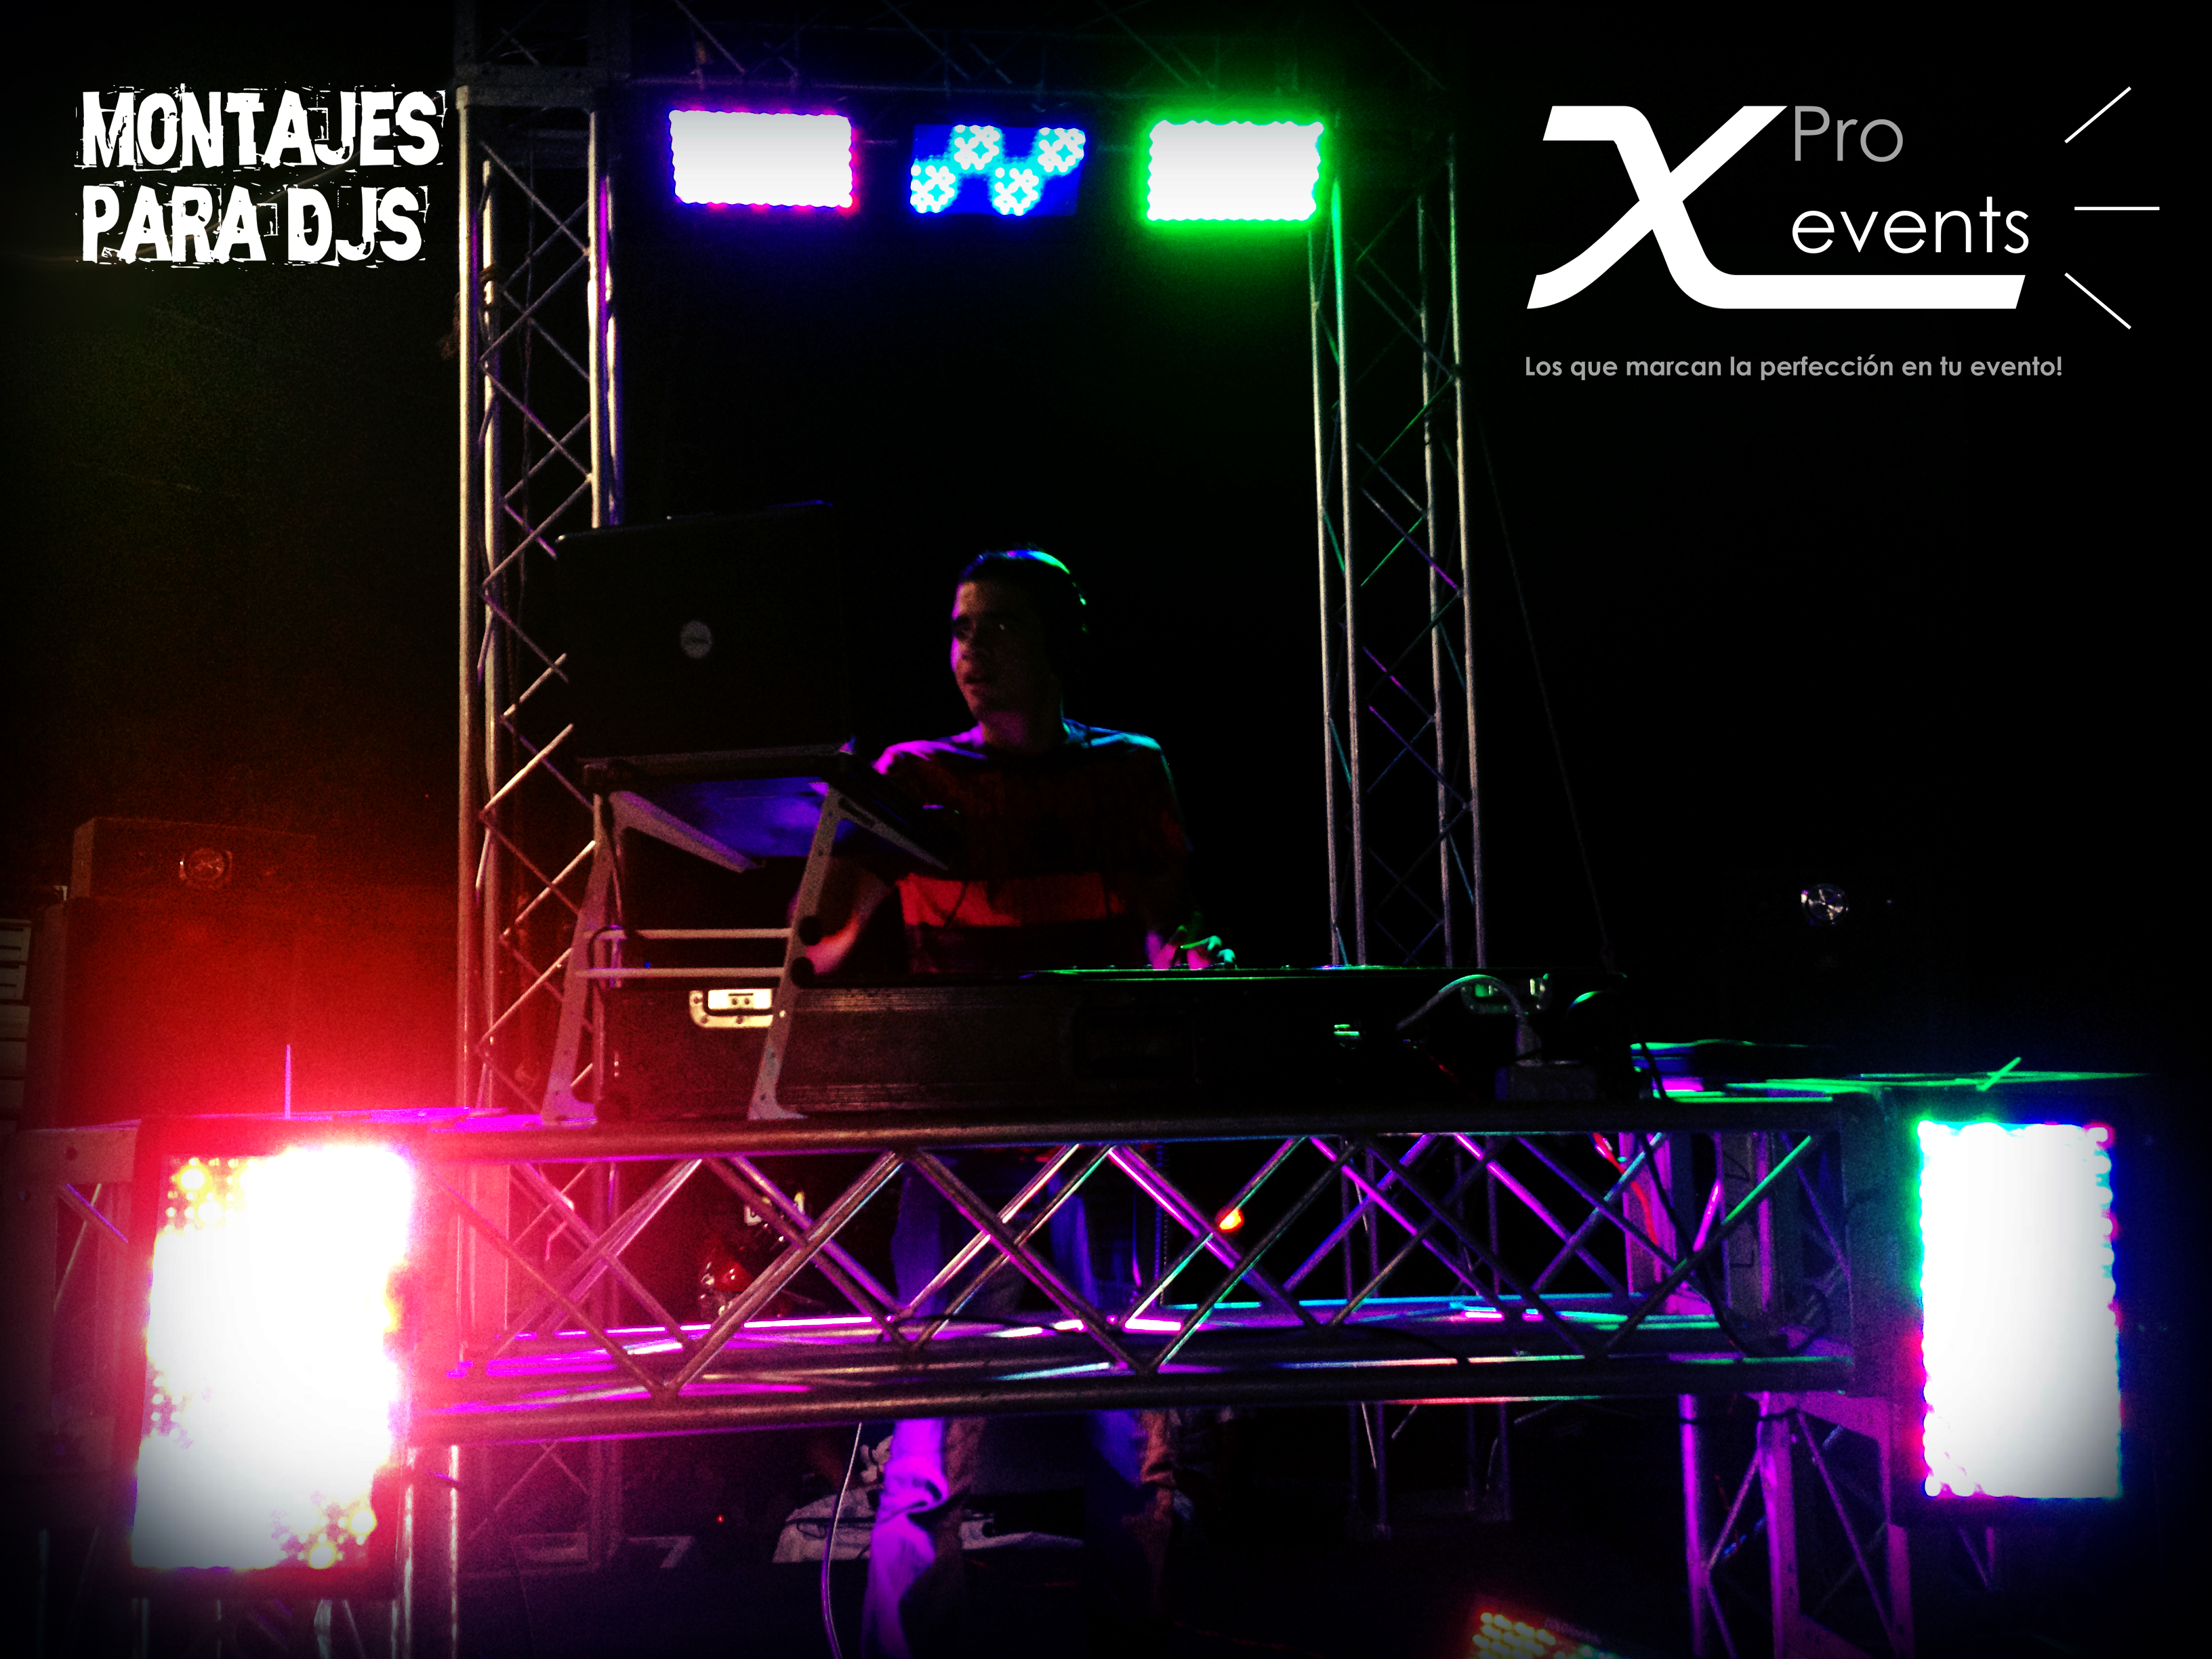 X Pro events  - 809-846-3784 - Escenarios para Djs - Montecristi.JPG